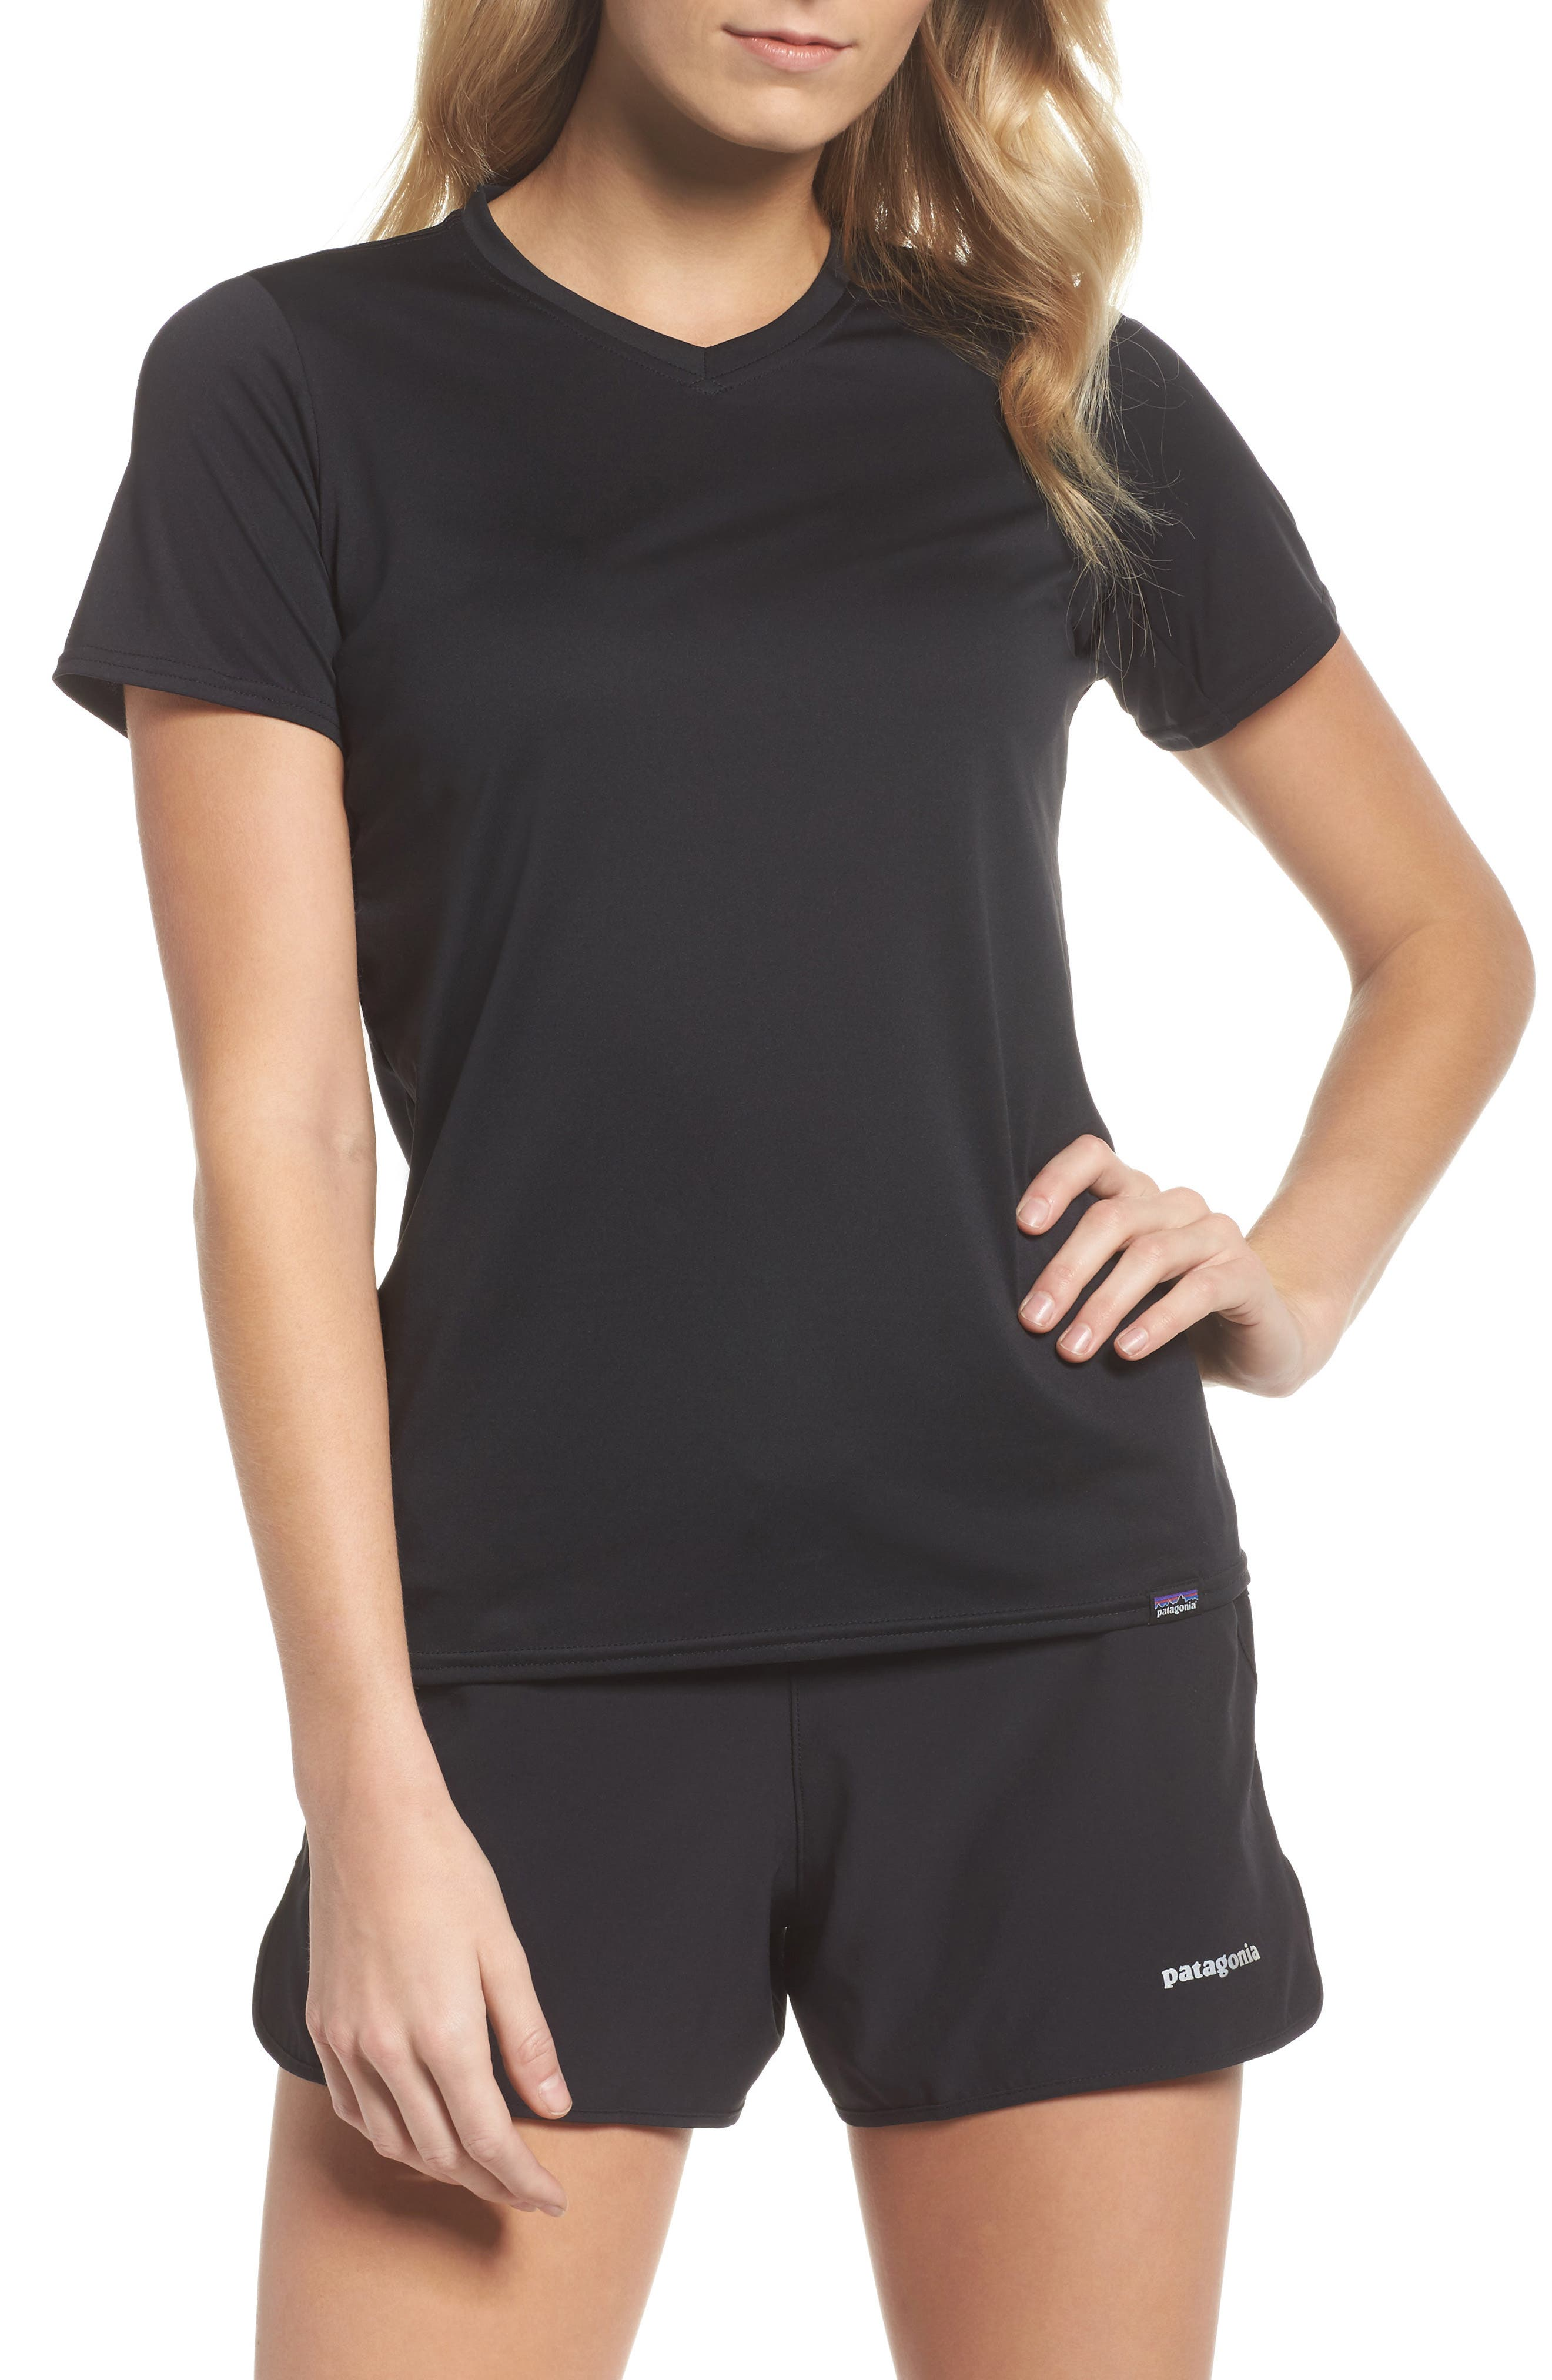 Capilene<sup>®</sup> Dailty T-Shirt,                             Main thumbnail 1, color,                             Black